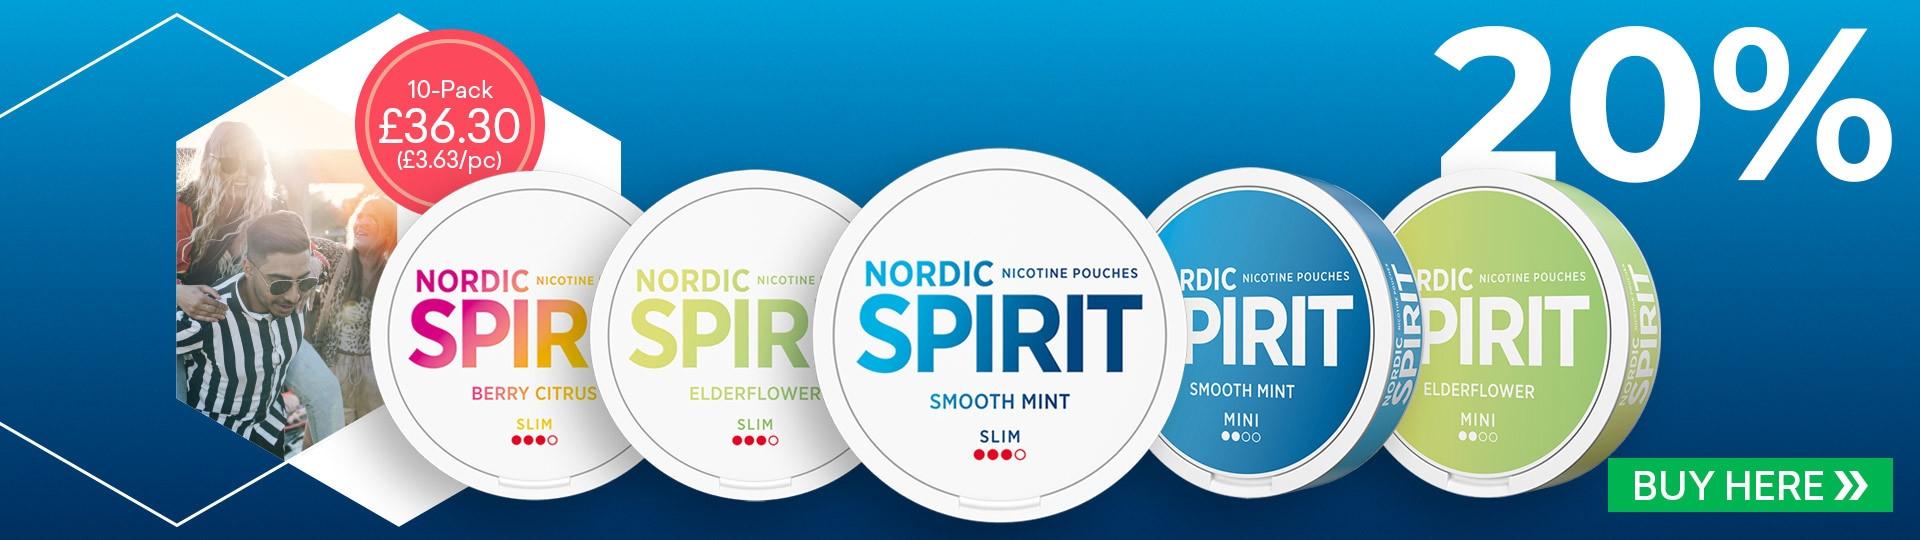 Nordic Spirit 20%